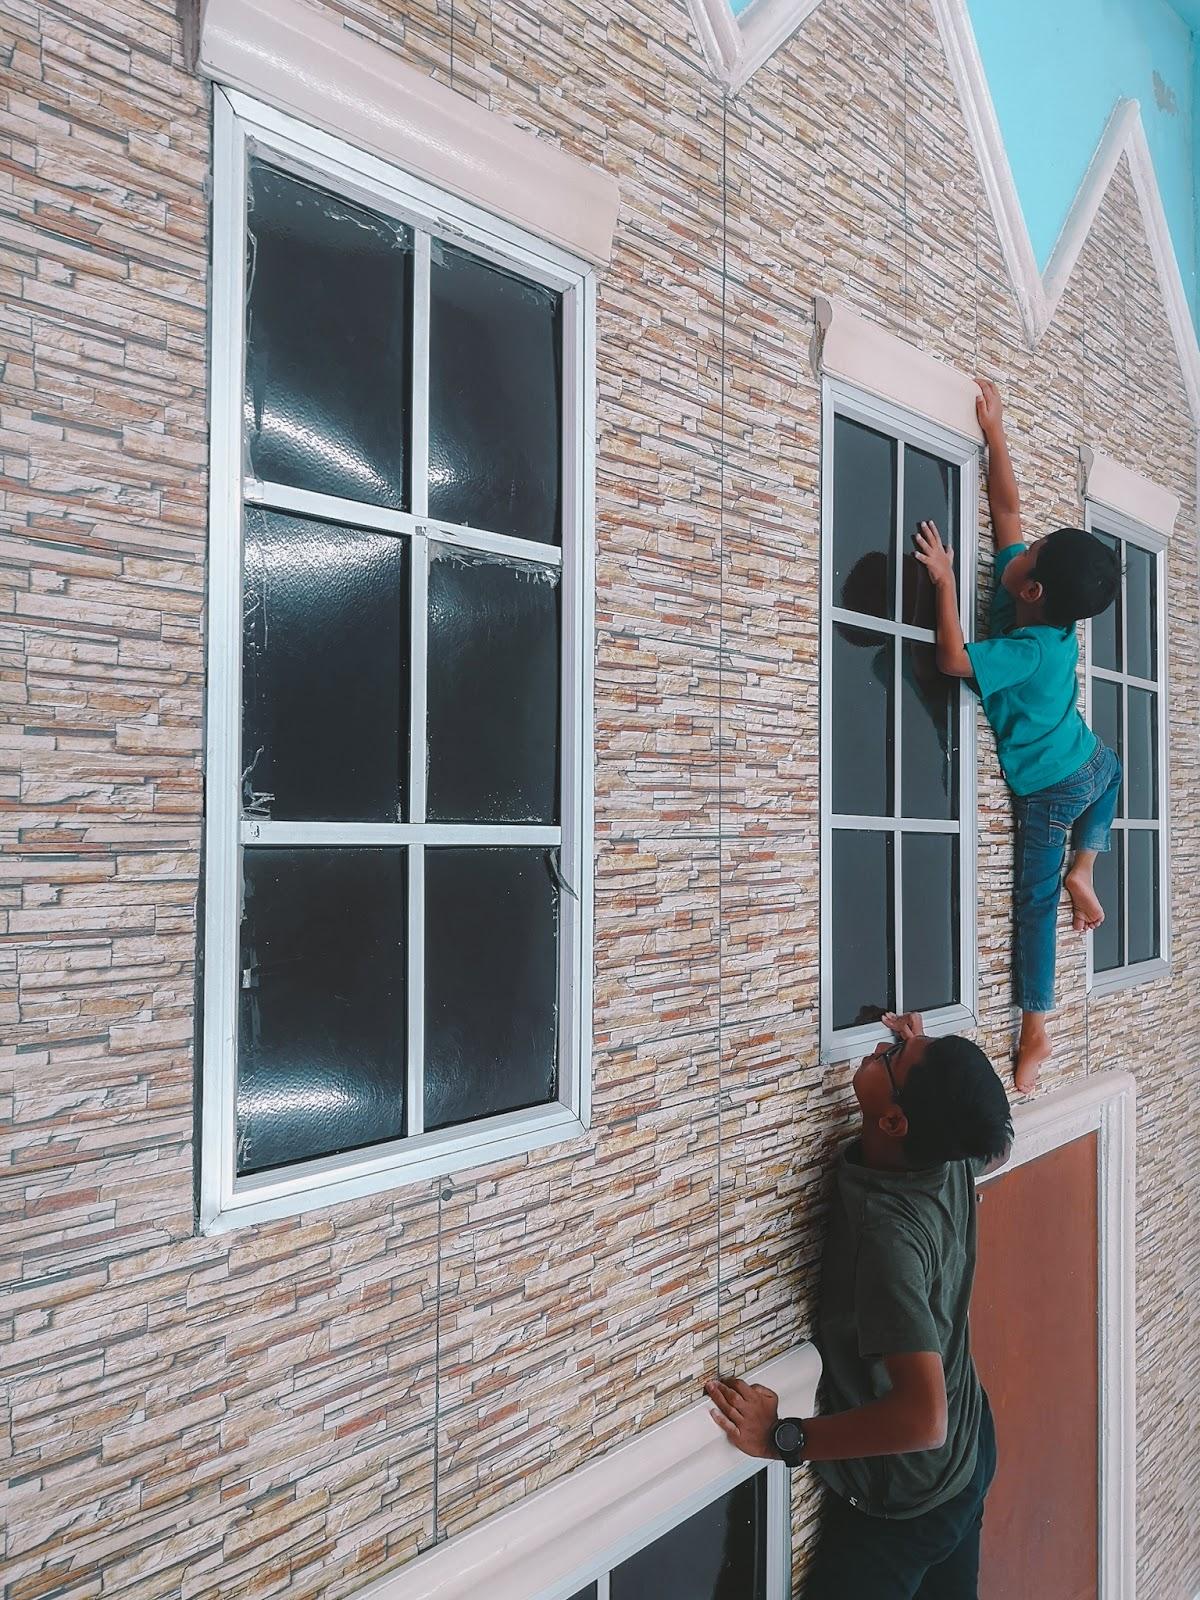 Rumah Terbalik Port Dickson, Negeri Sembilan - panjat